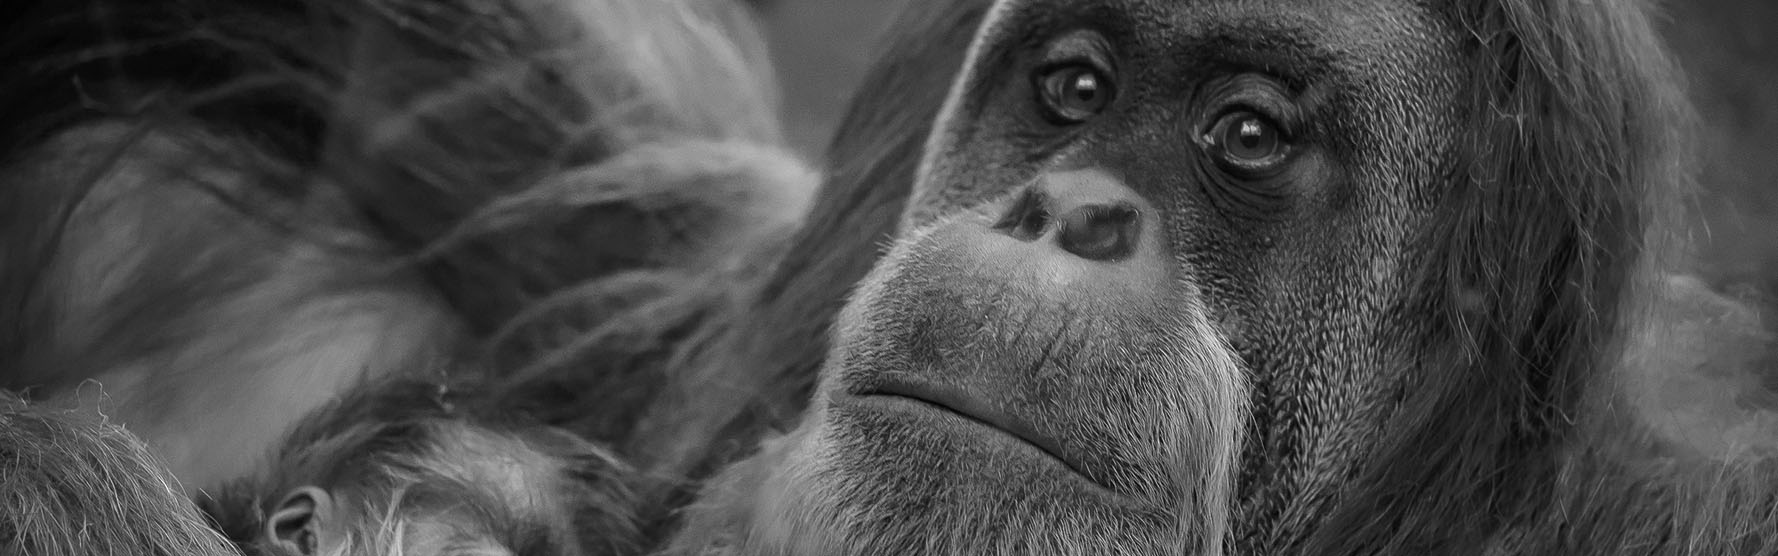 Reuter's Report: Wheelbarrow Orangutans